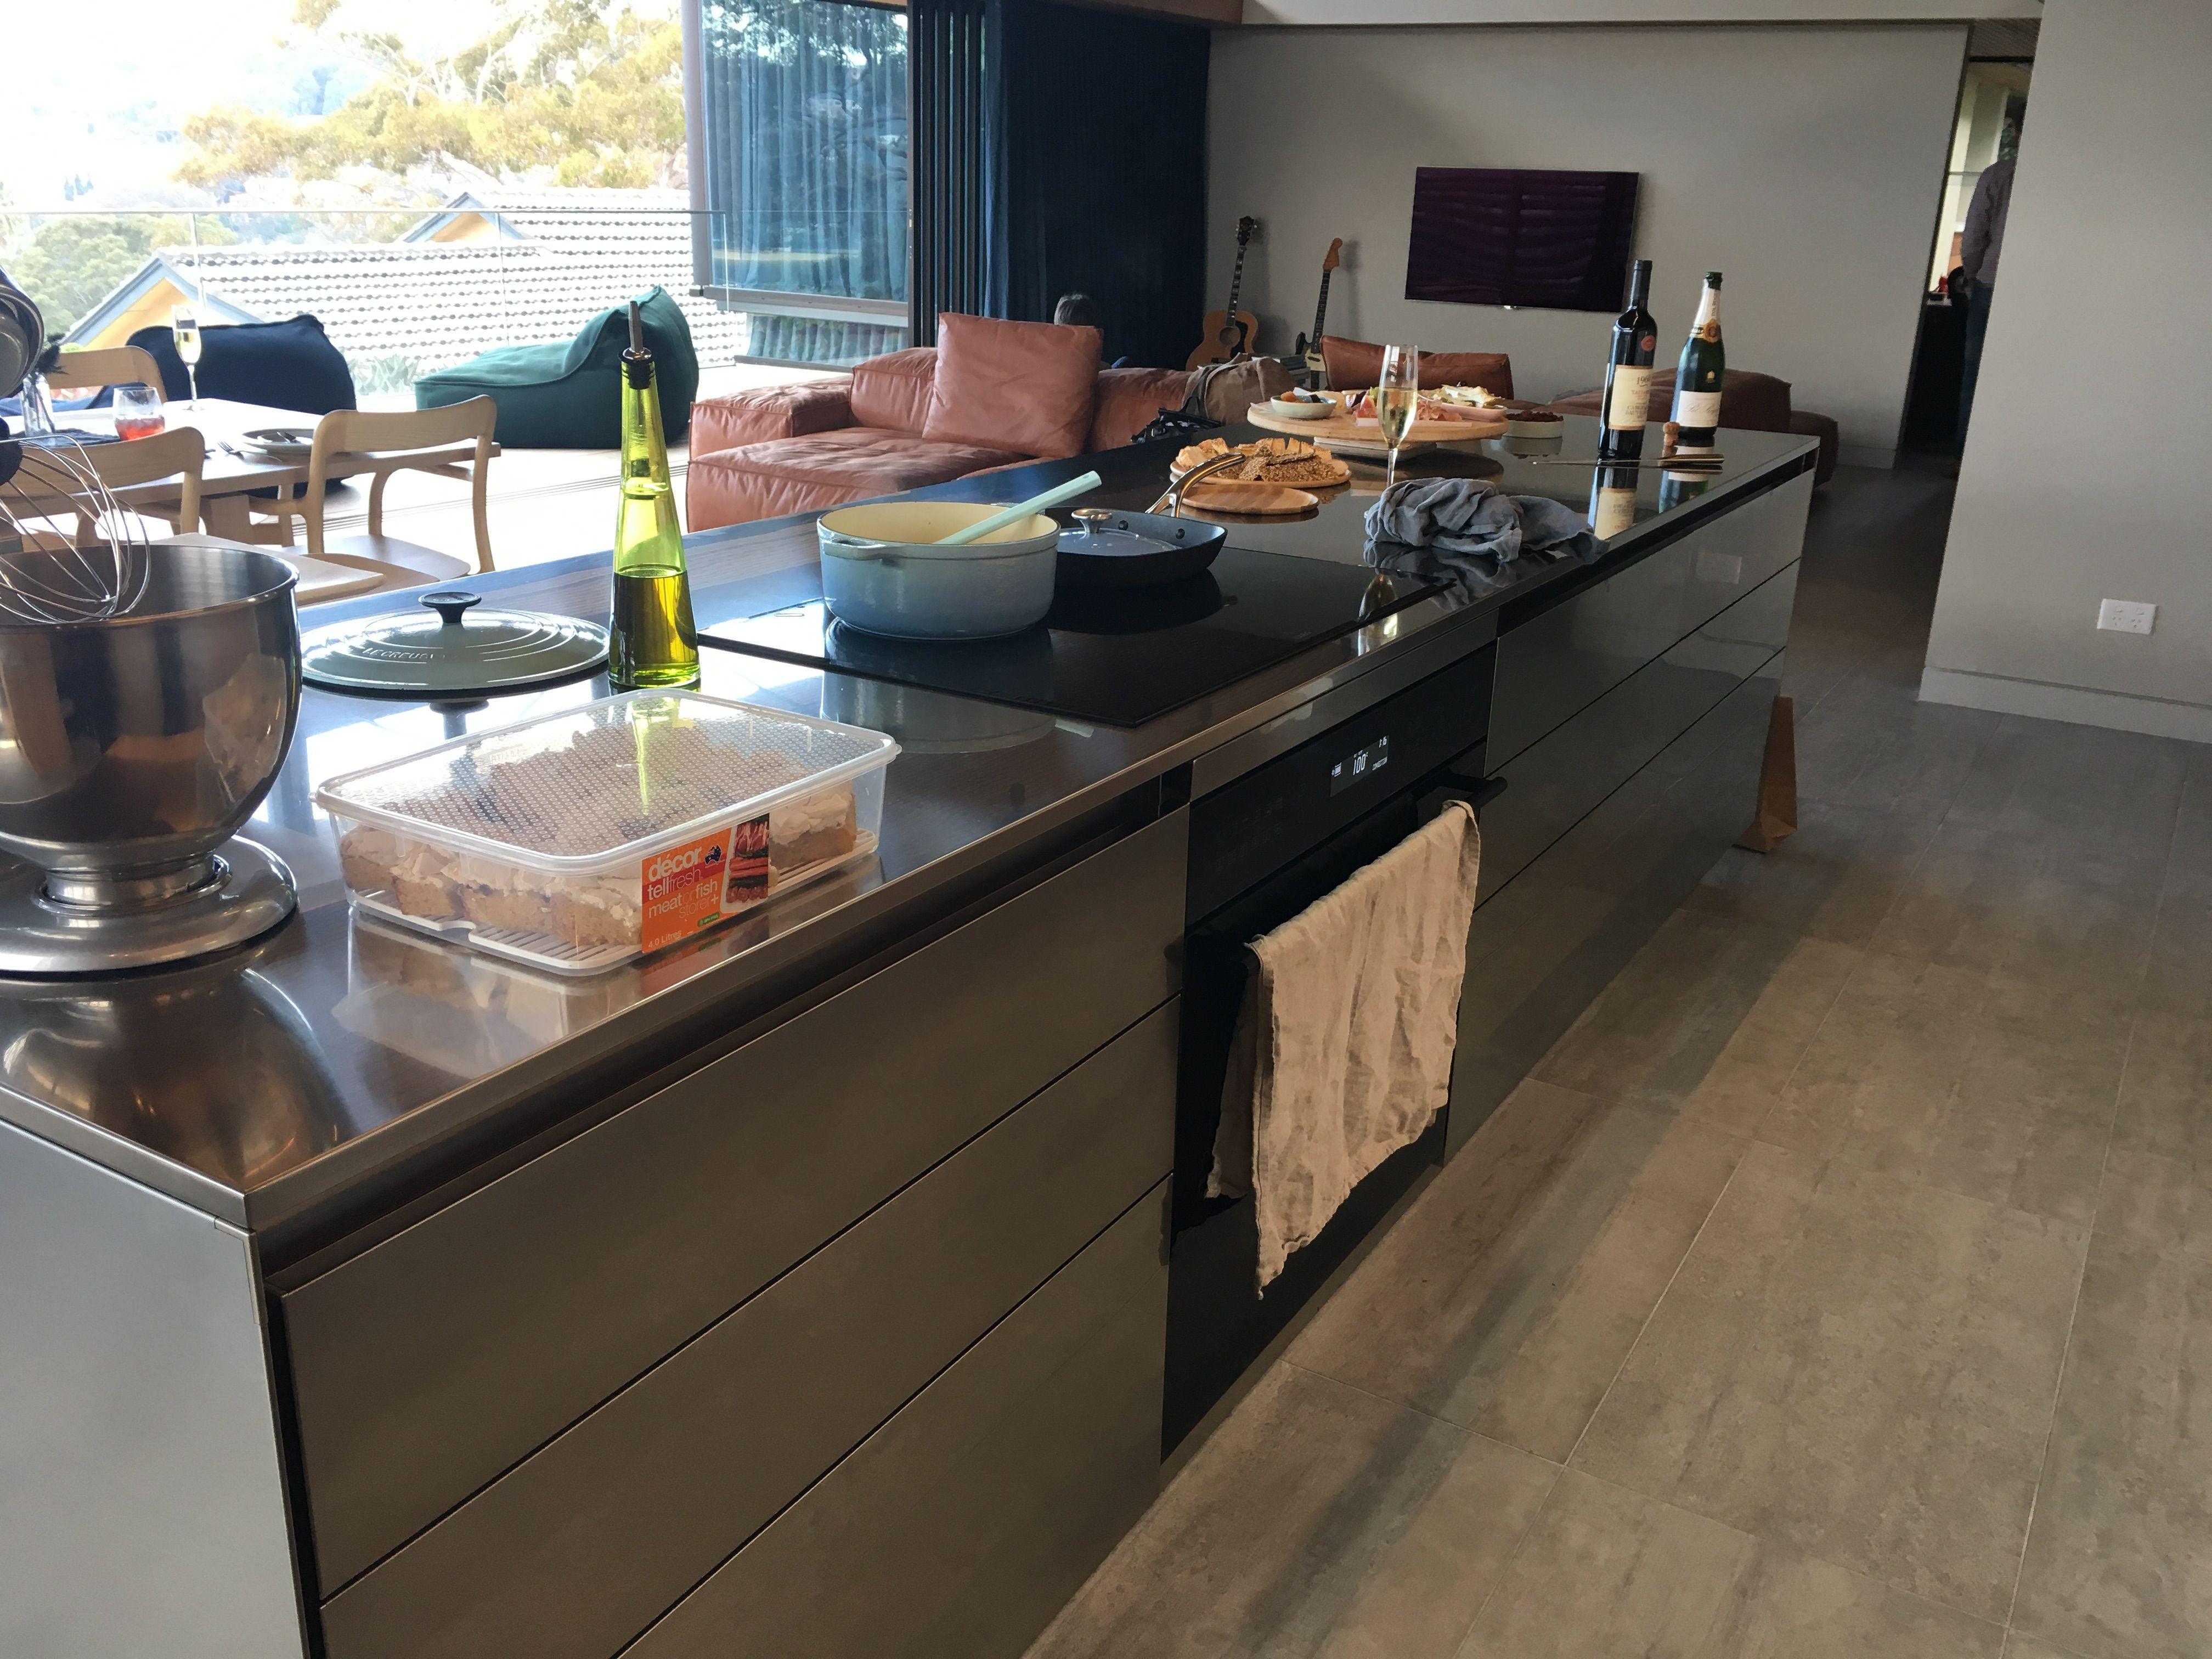 Bulthaup Küchenrollenhalter ~ 87 best kitchen images on pinterest contemporary unit kitchens